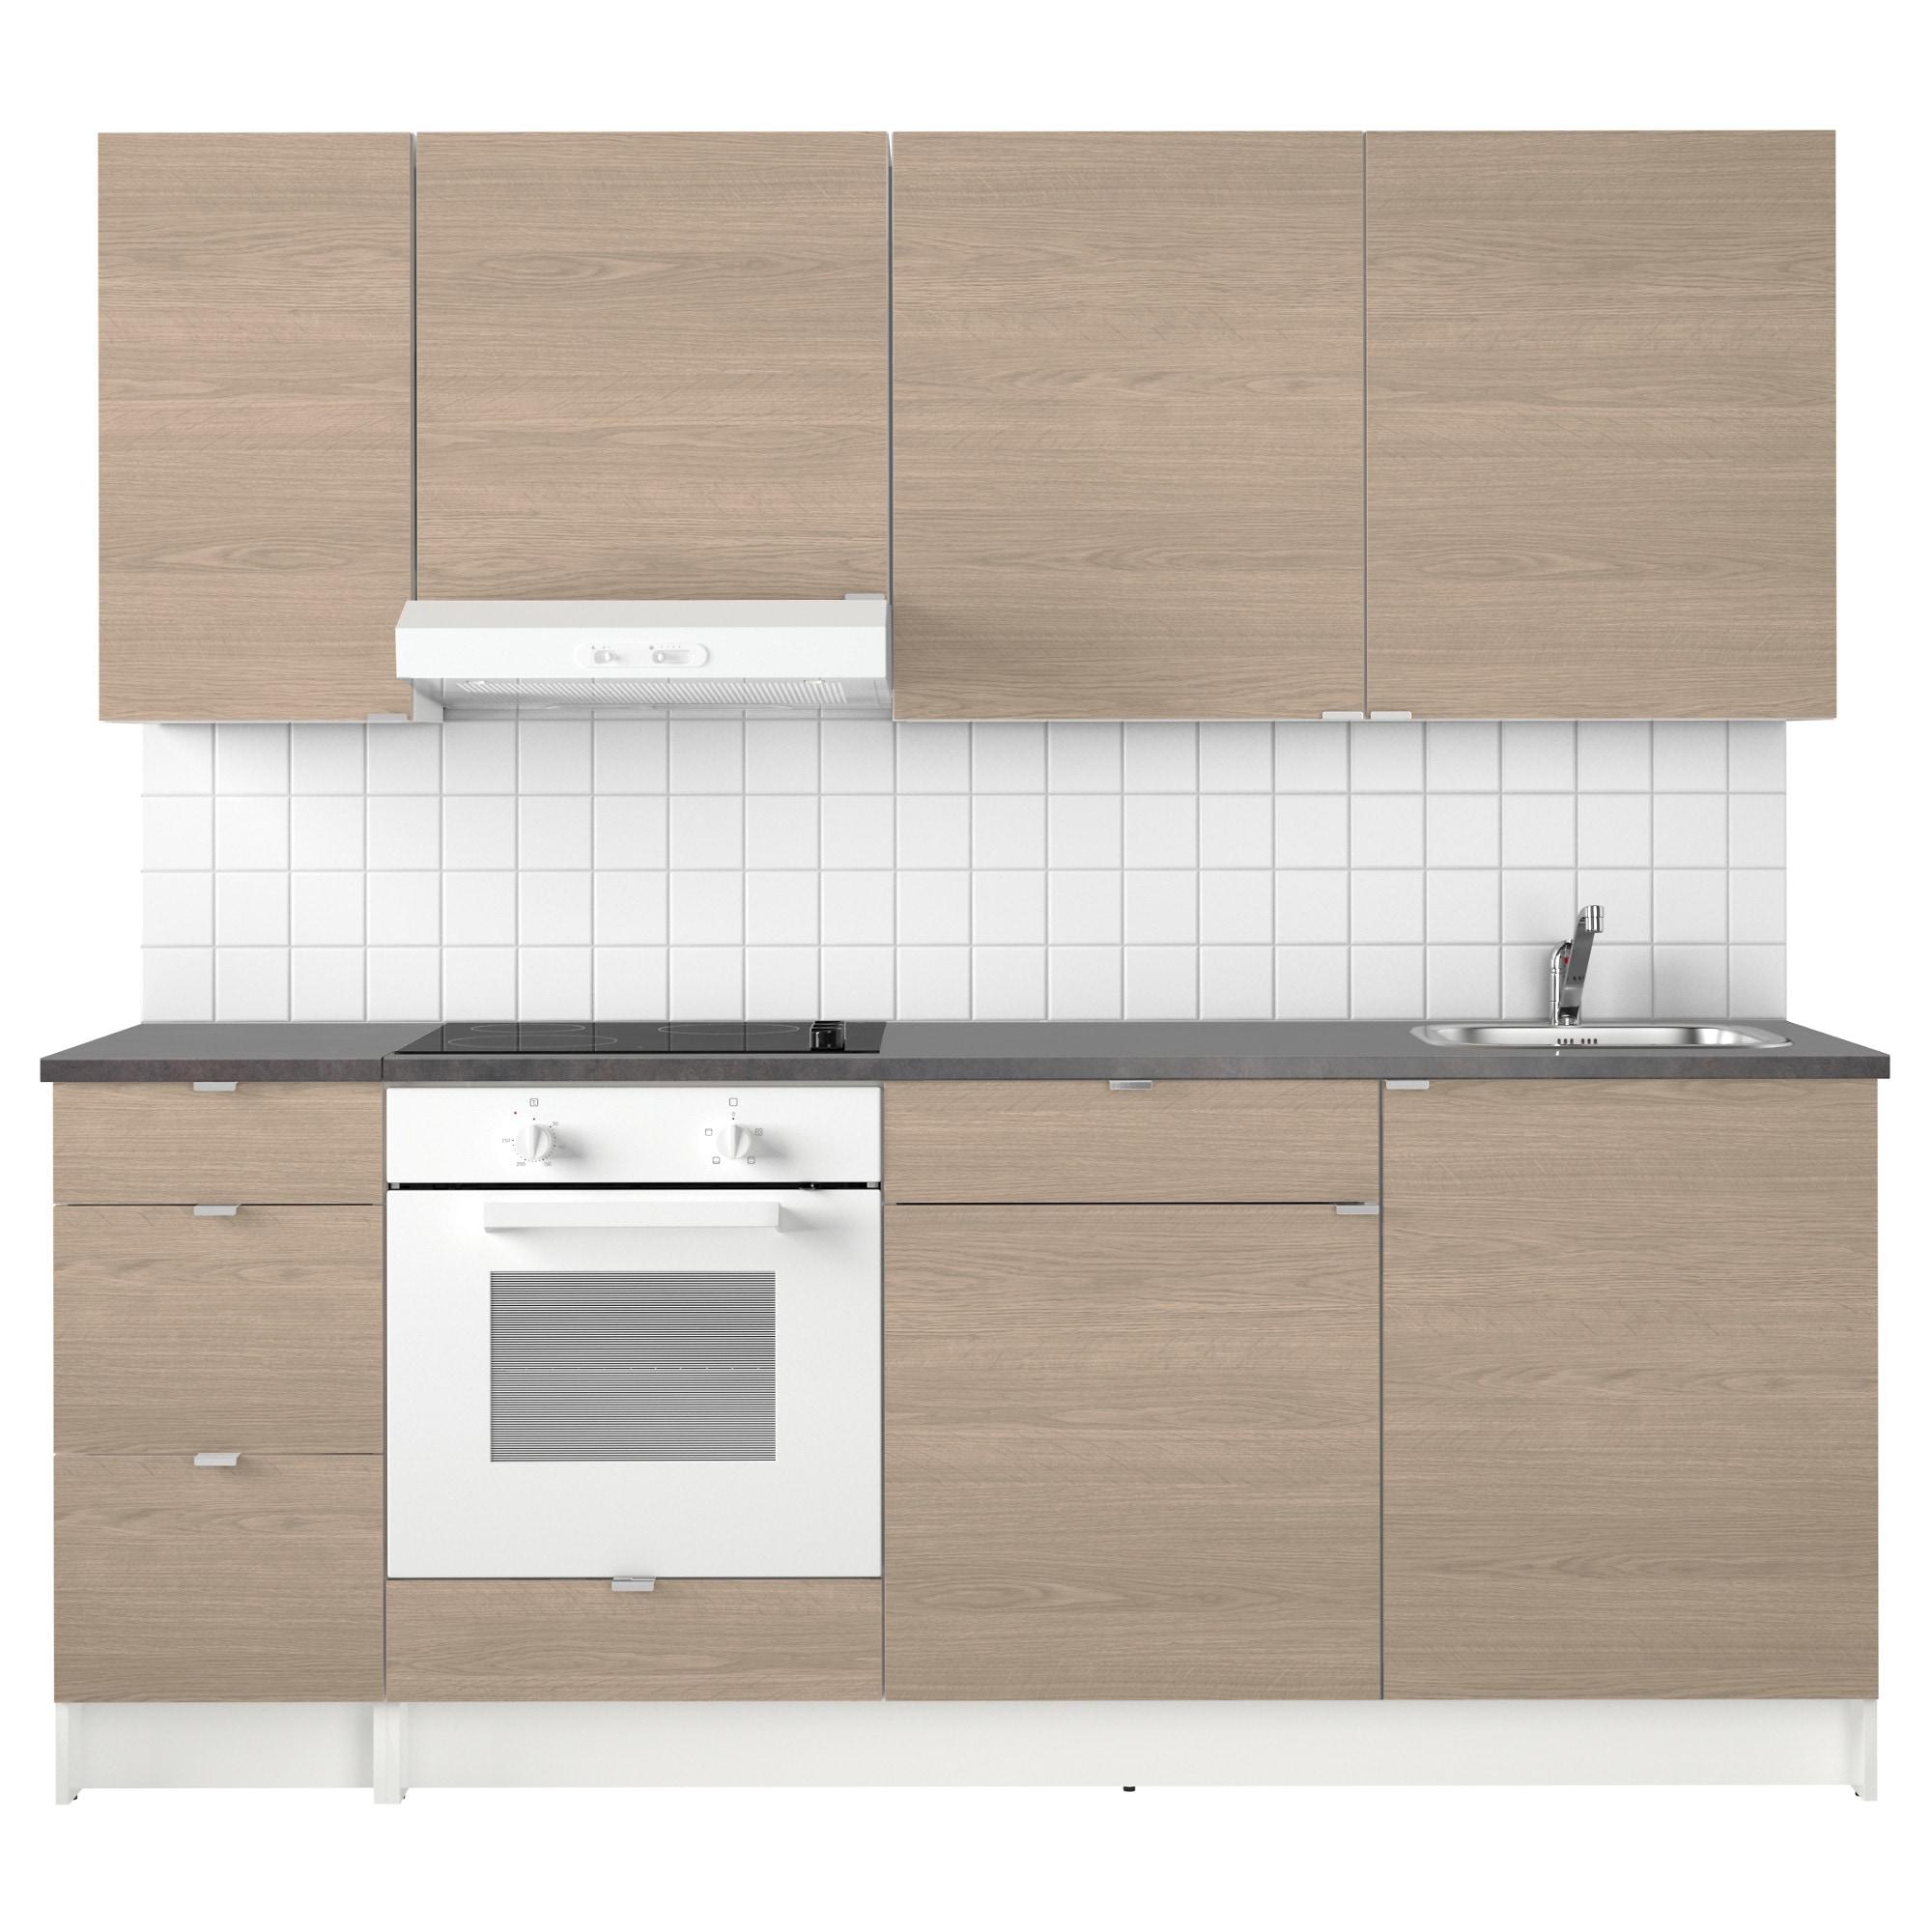 Värde Küche Holz | Eck Kleiderschränke Ikea | Leeds Eiche ...